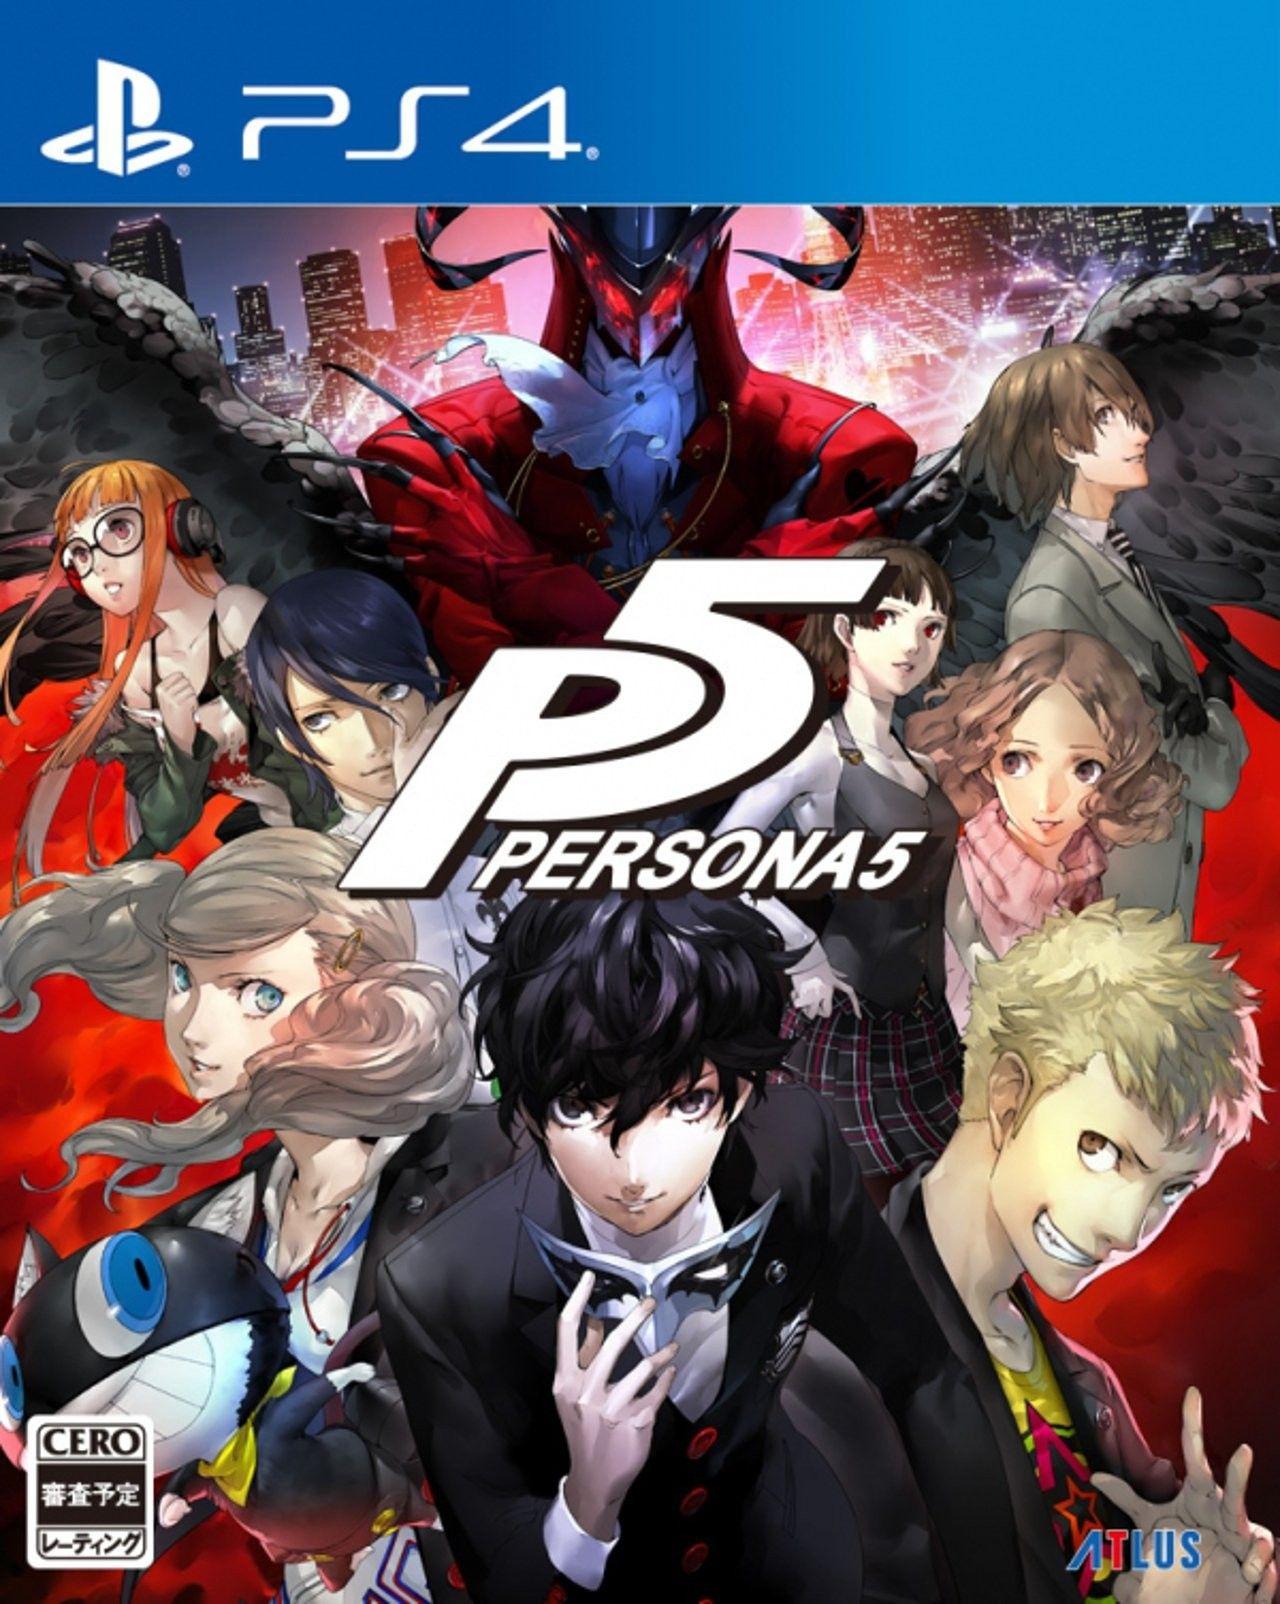 Persona 5 (PS4) /możliwe 142,4zł/